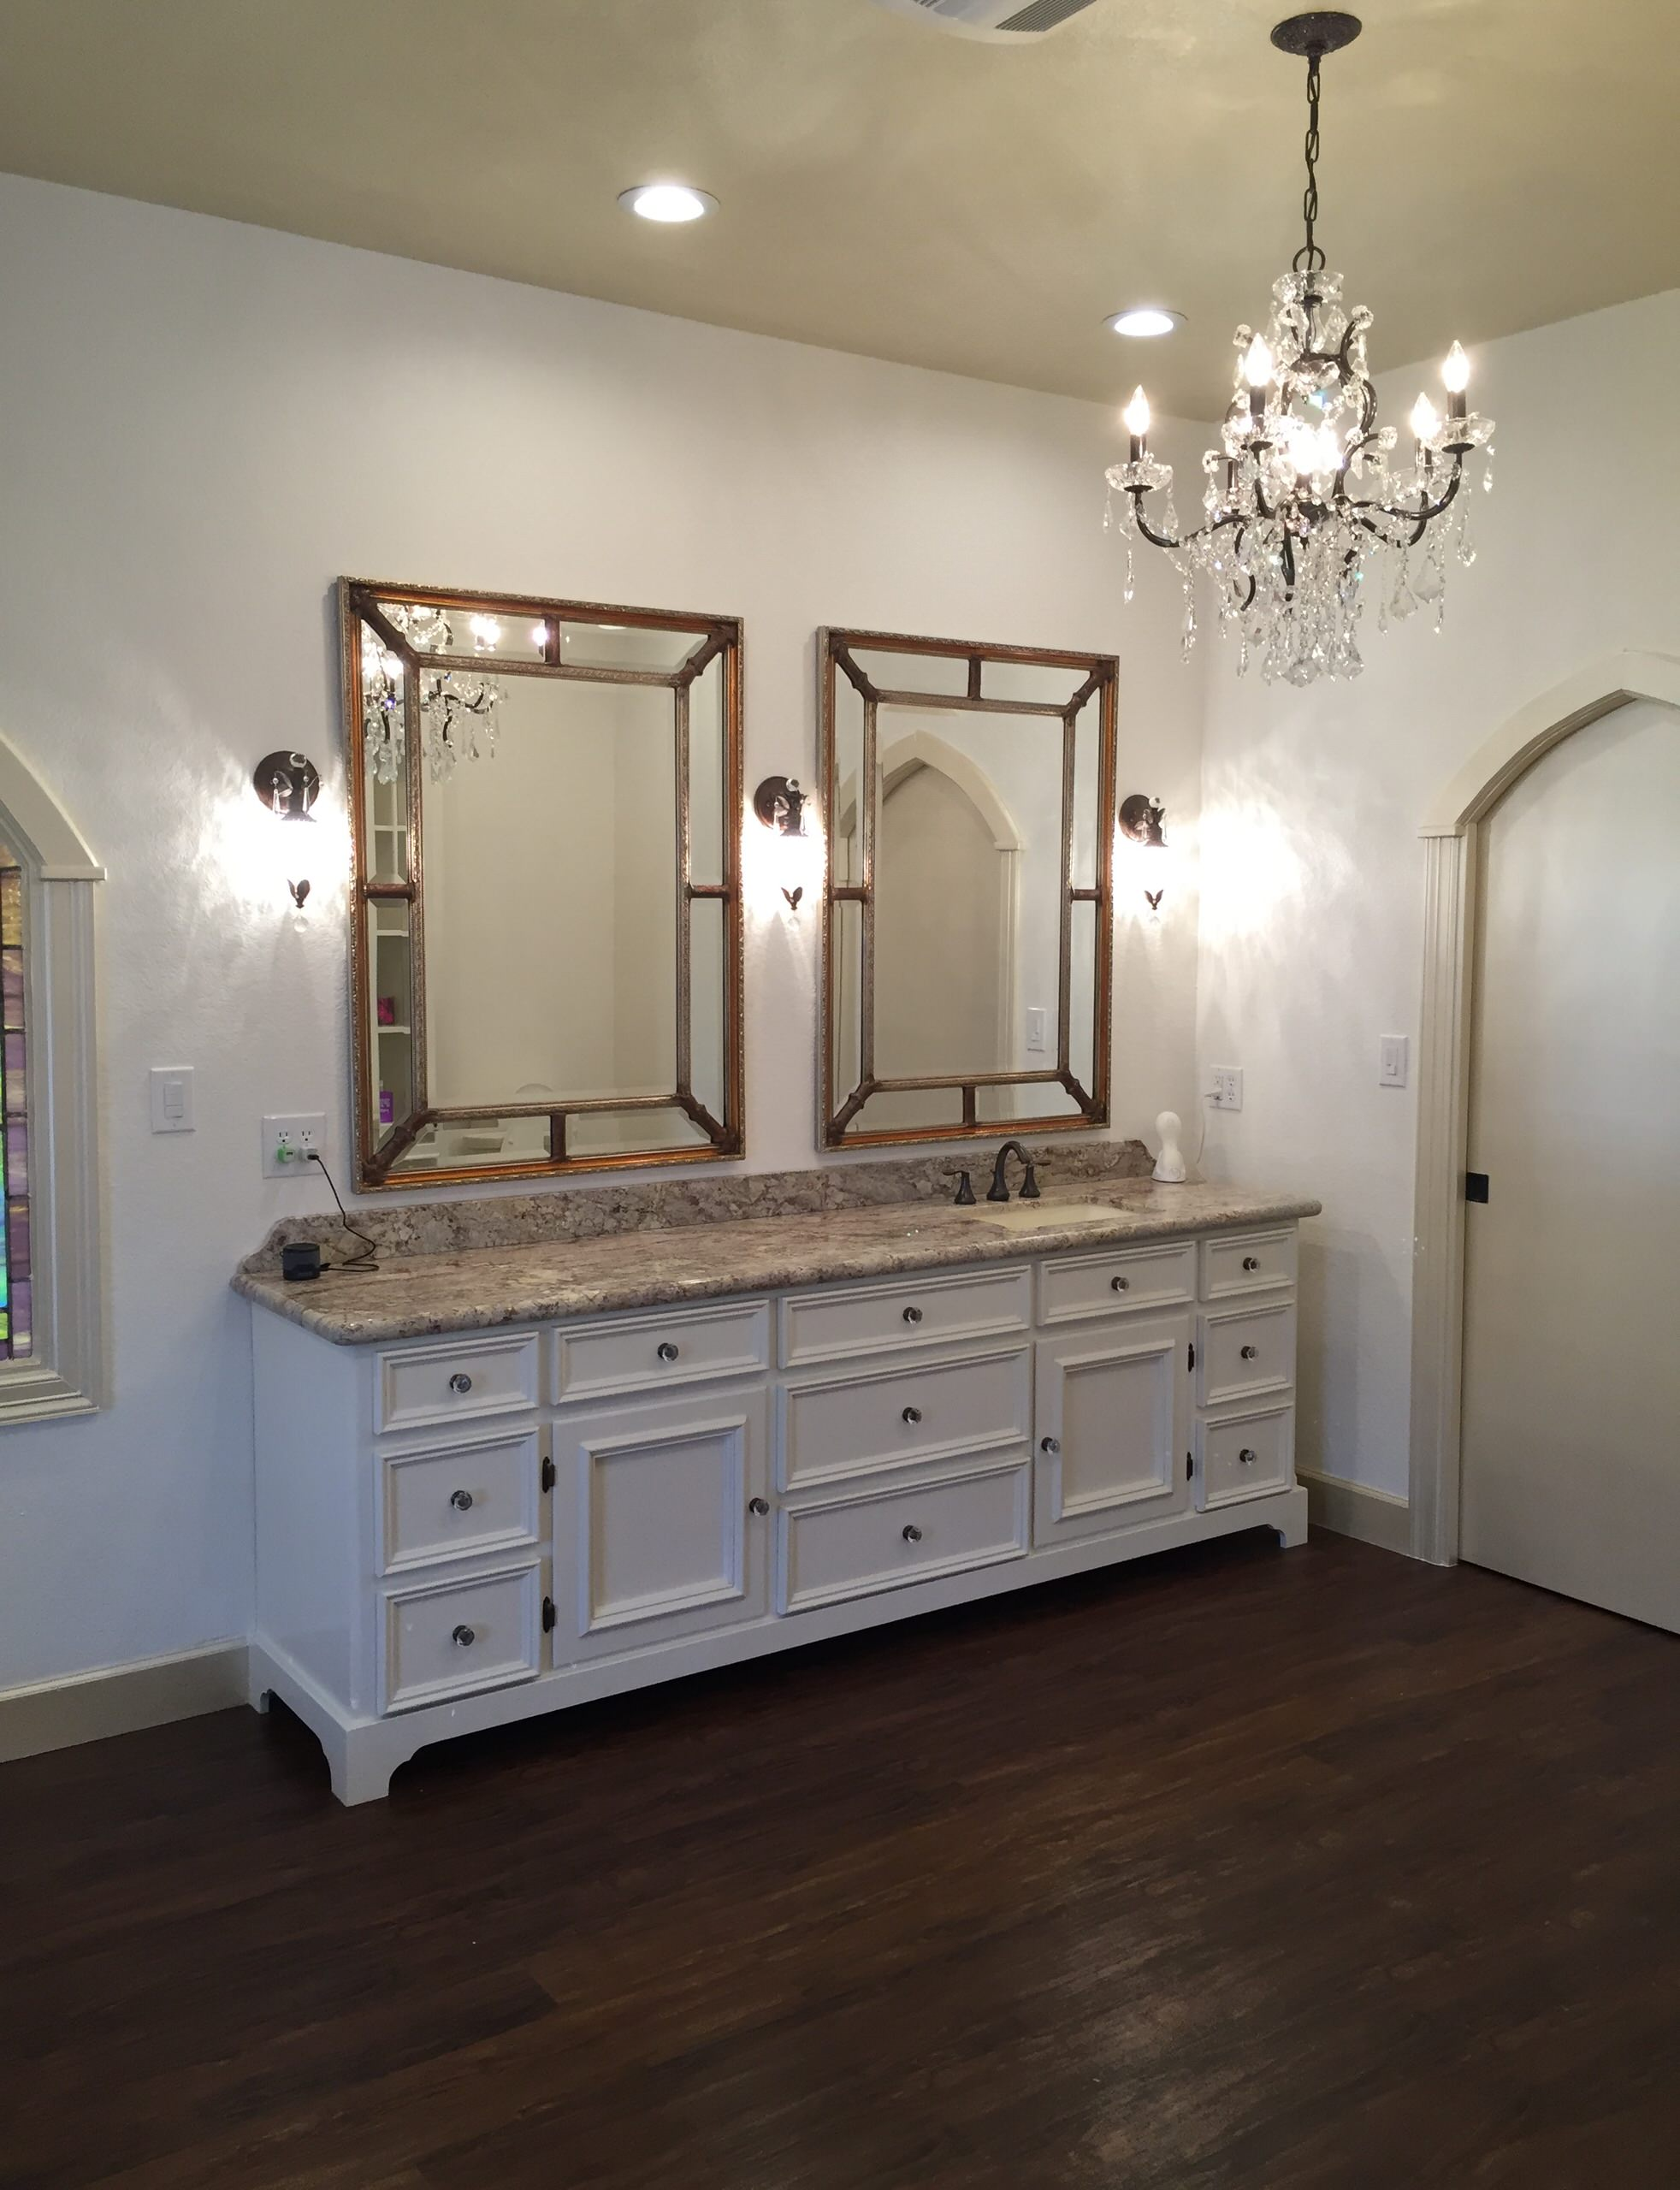 Ranch House - Master Bathroom Remodel - 2015